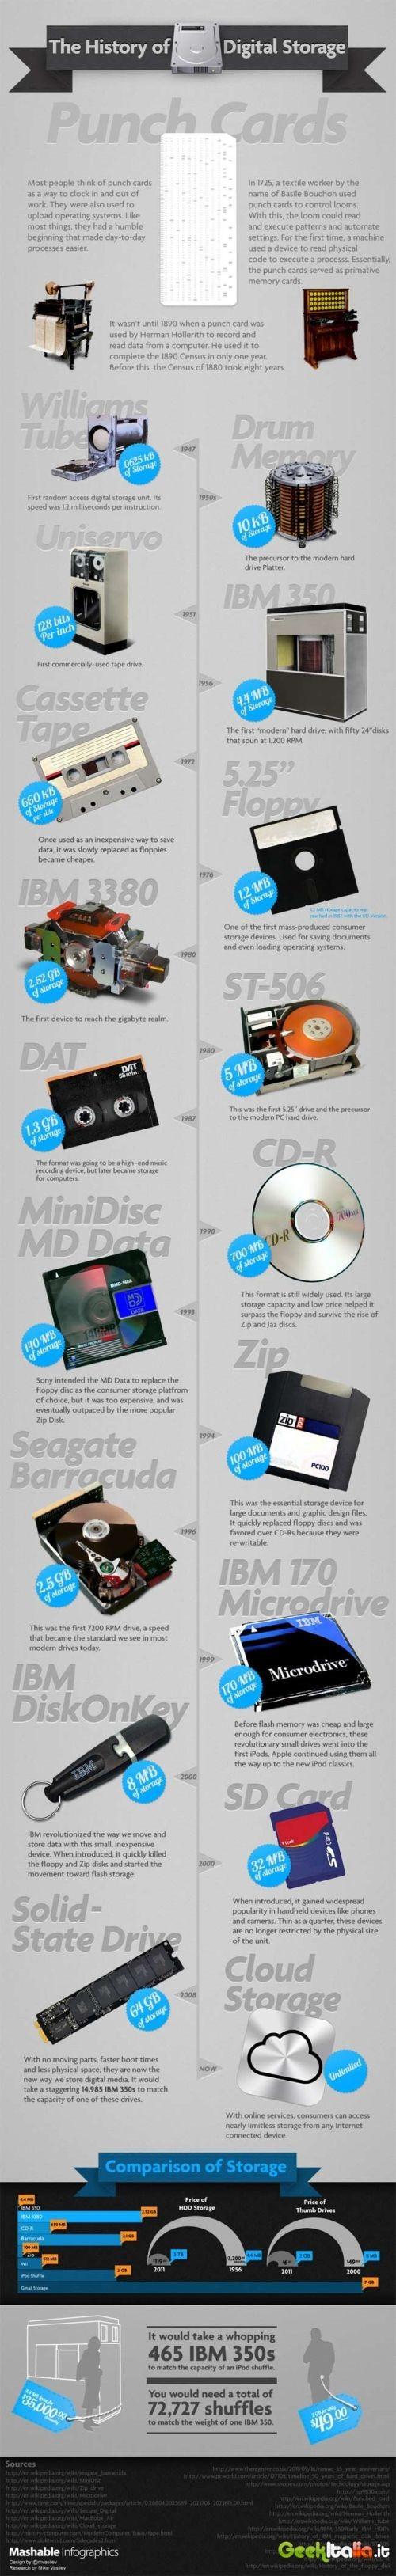 digital_storage_history_full